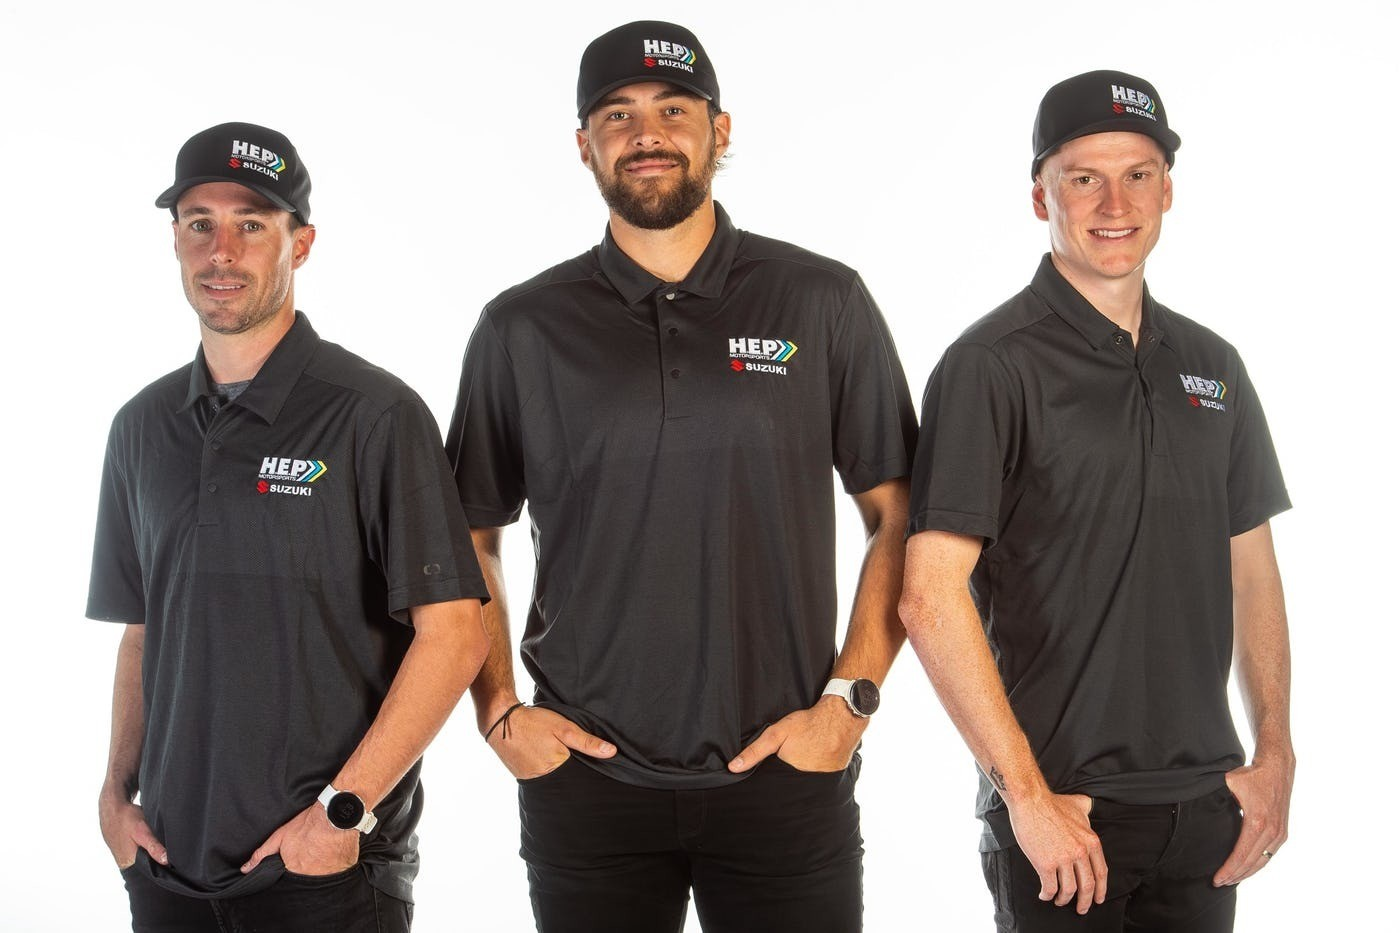 H.E.P. Motorsports Announces 2020 Rider Lineup